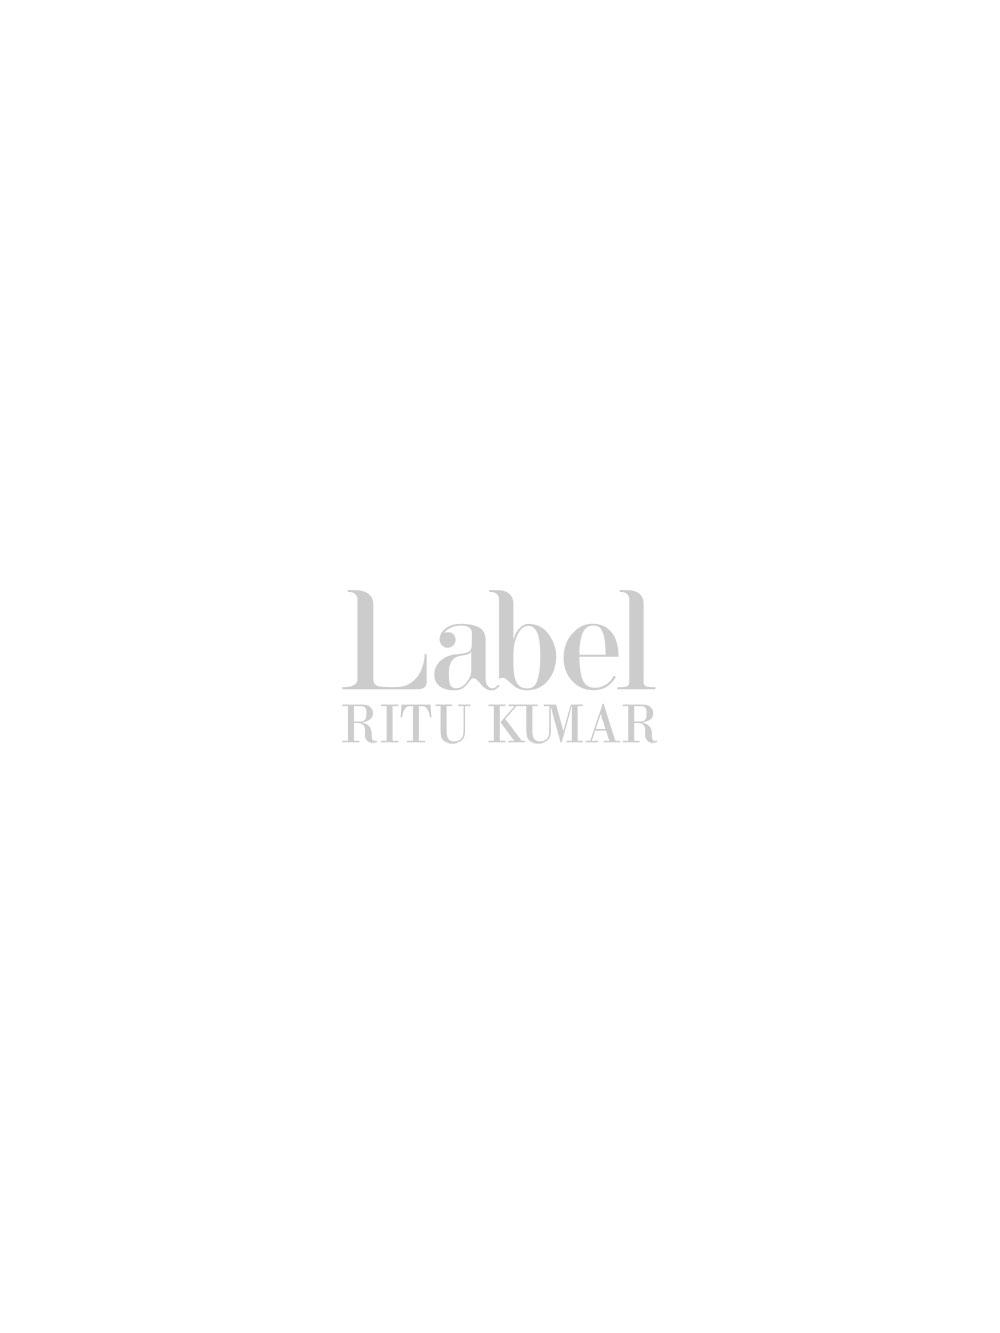 Indigo Sleeveless Top in Signature Label Ritu Kumar Print